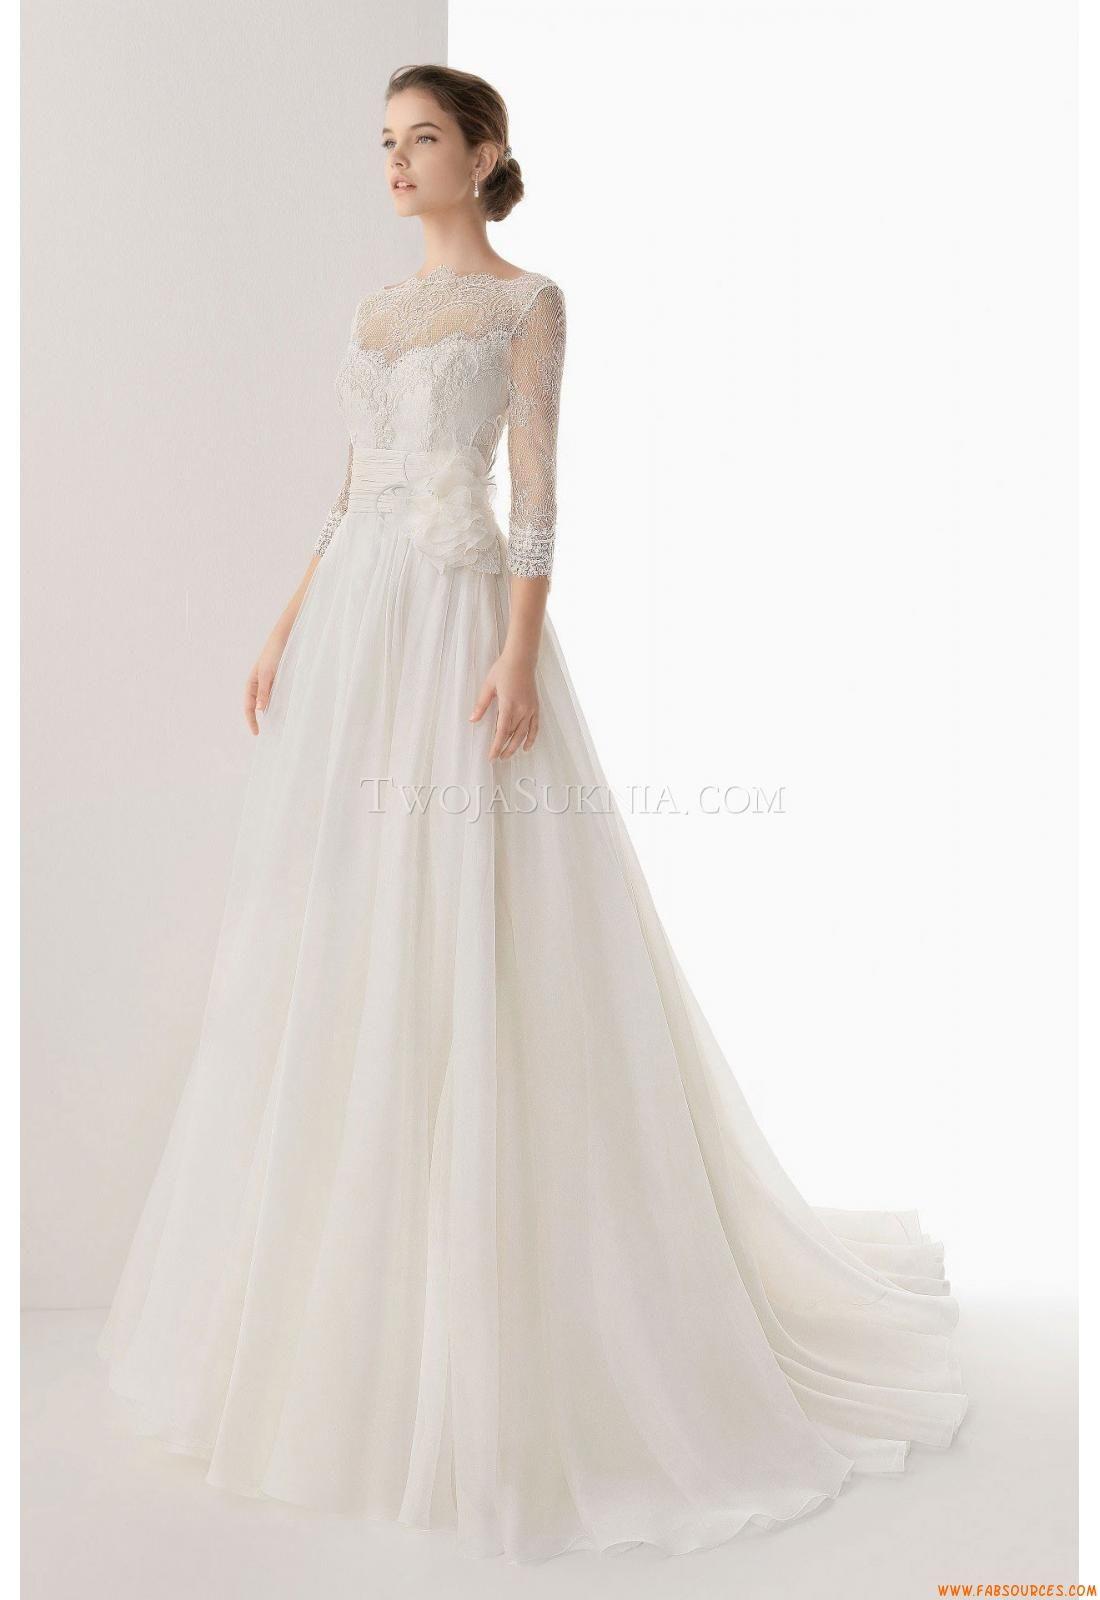 Robes de mariée Rosa Clara 16 Camerun 16  Braut, Brautkleid